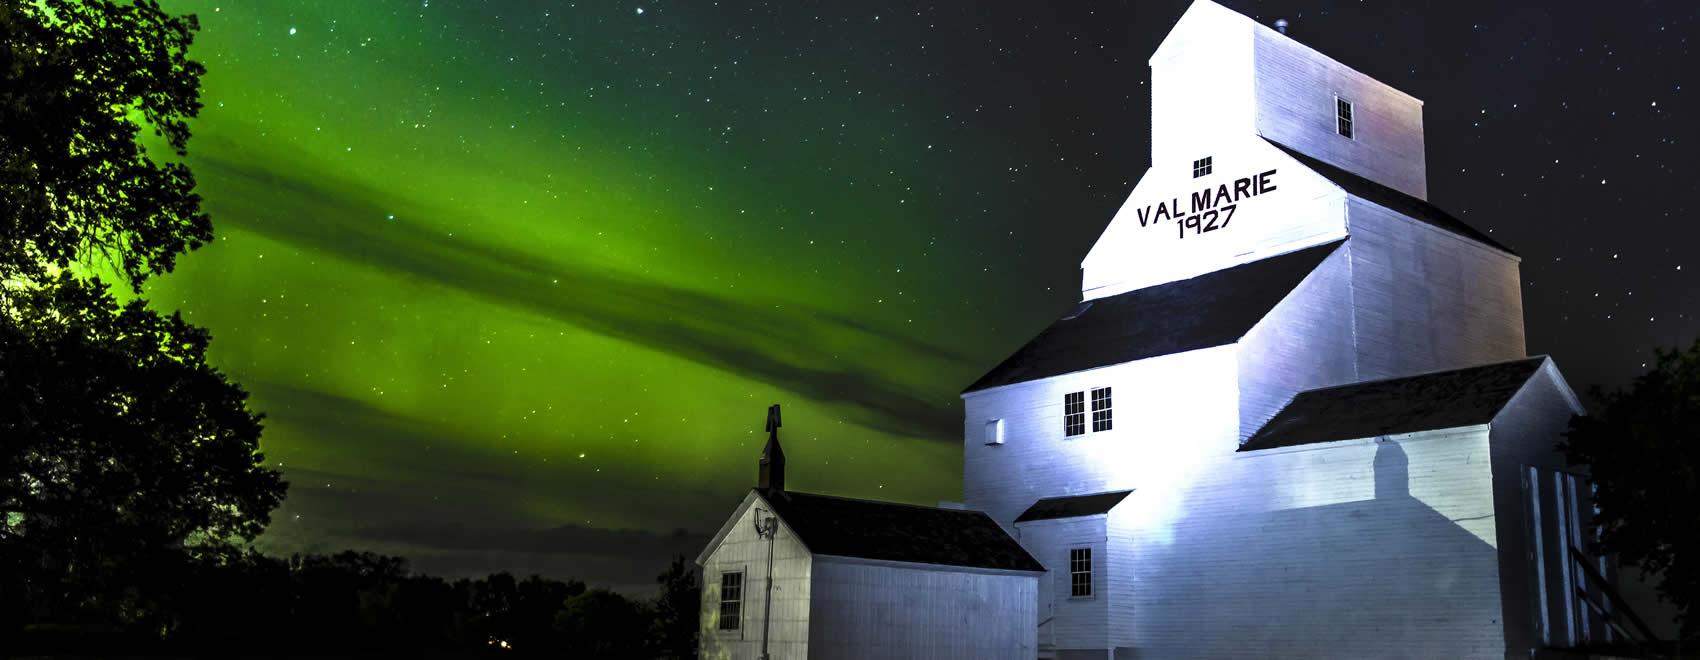 Val Marie Heritage Grain Elevator